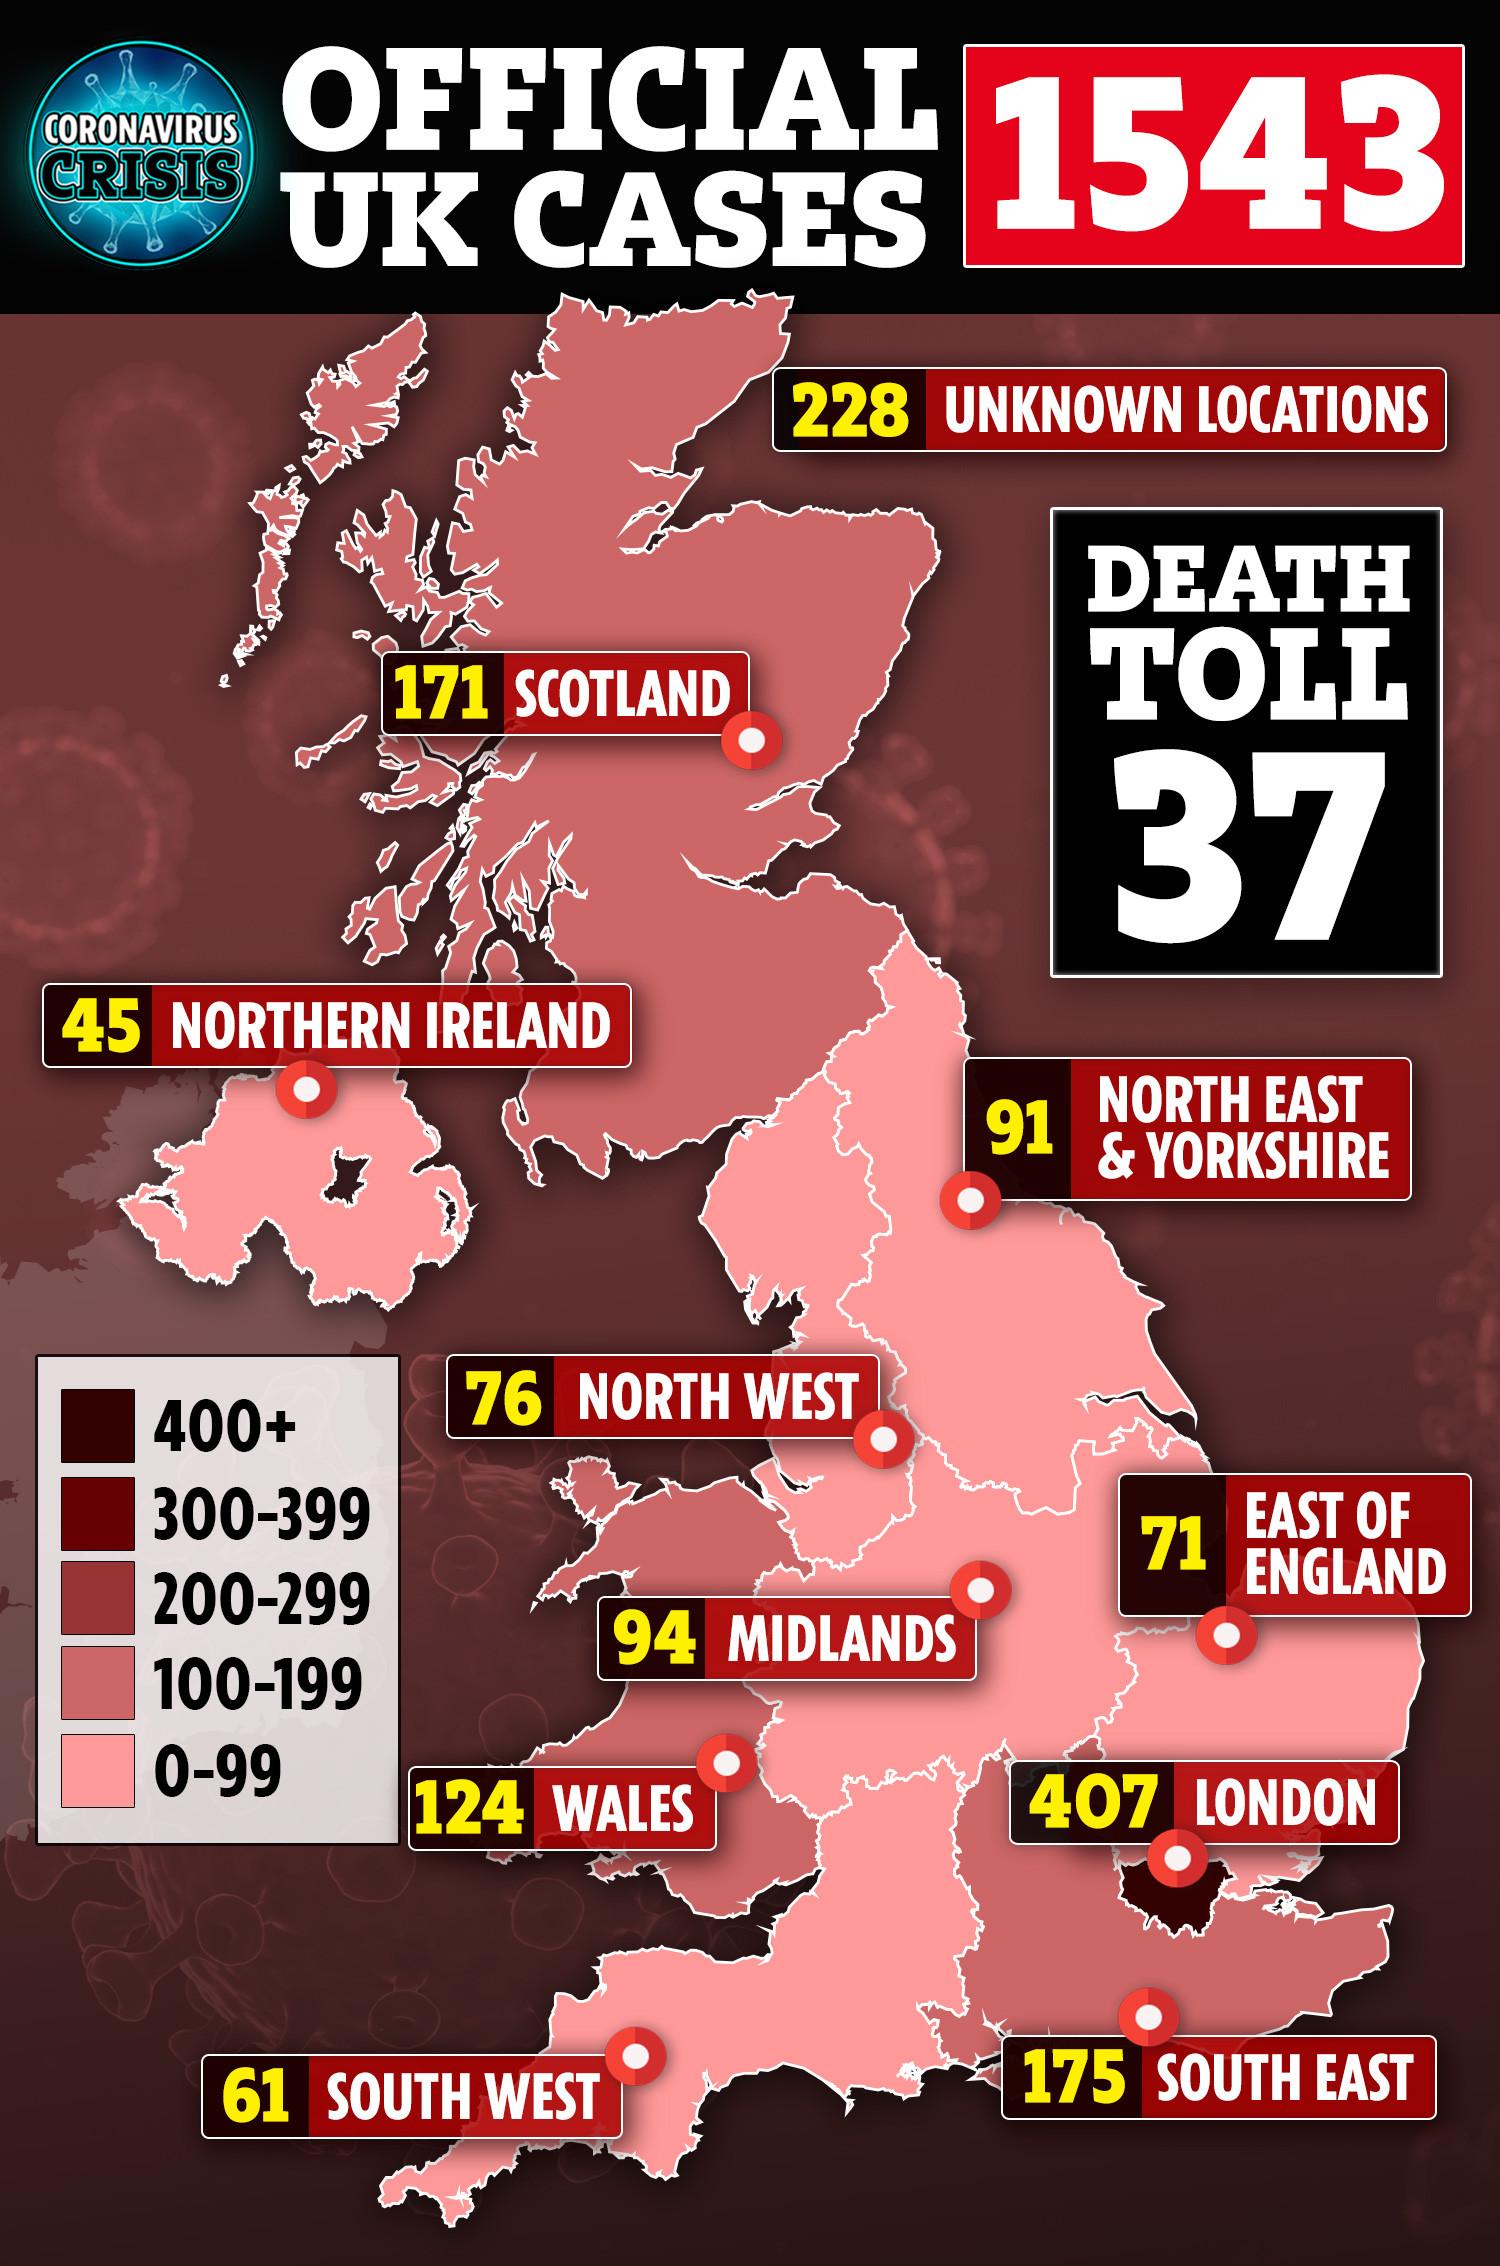 Coronavirus has claimed the lives of 37 in the UK so far